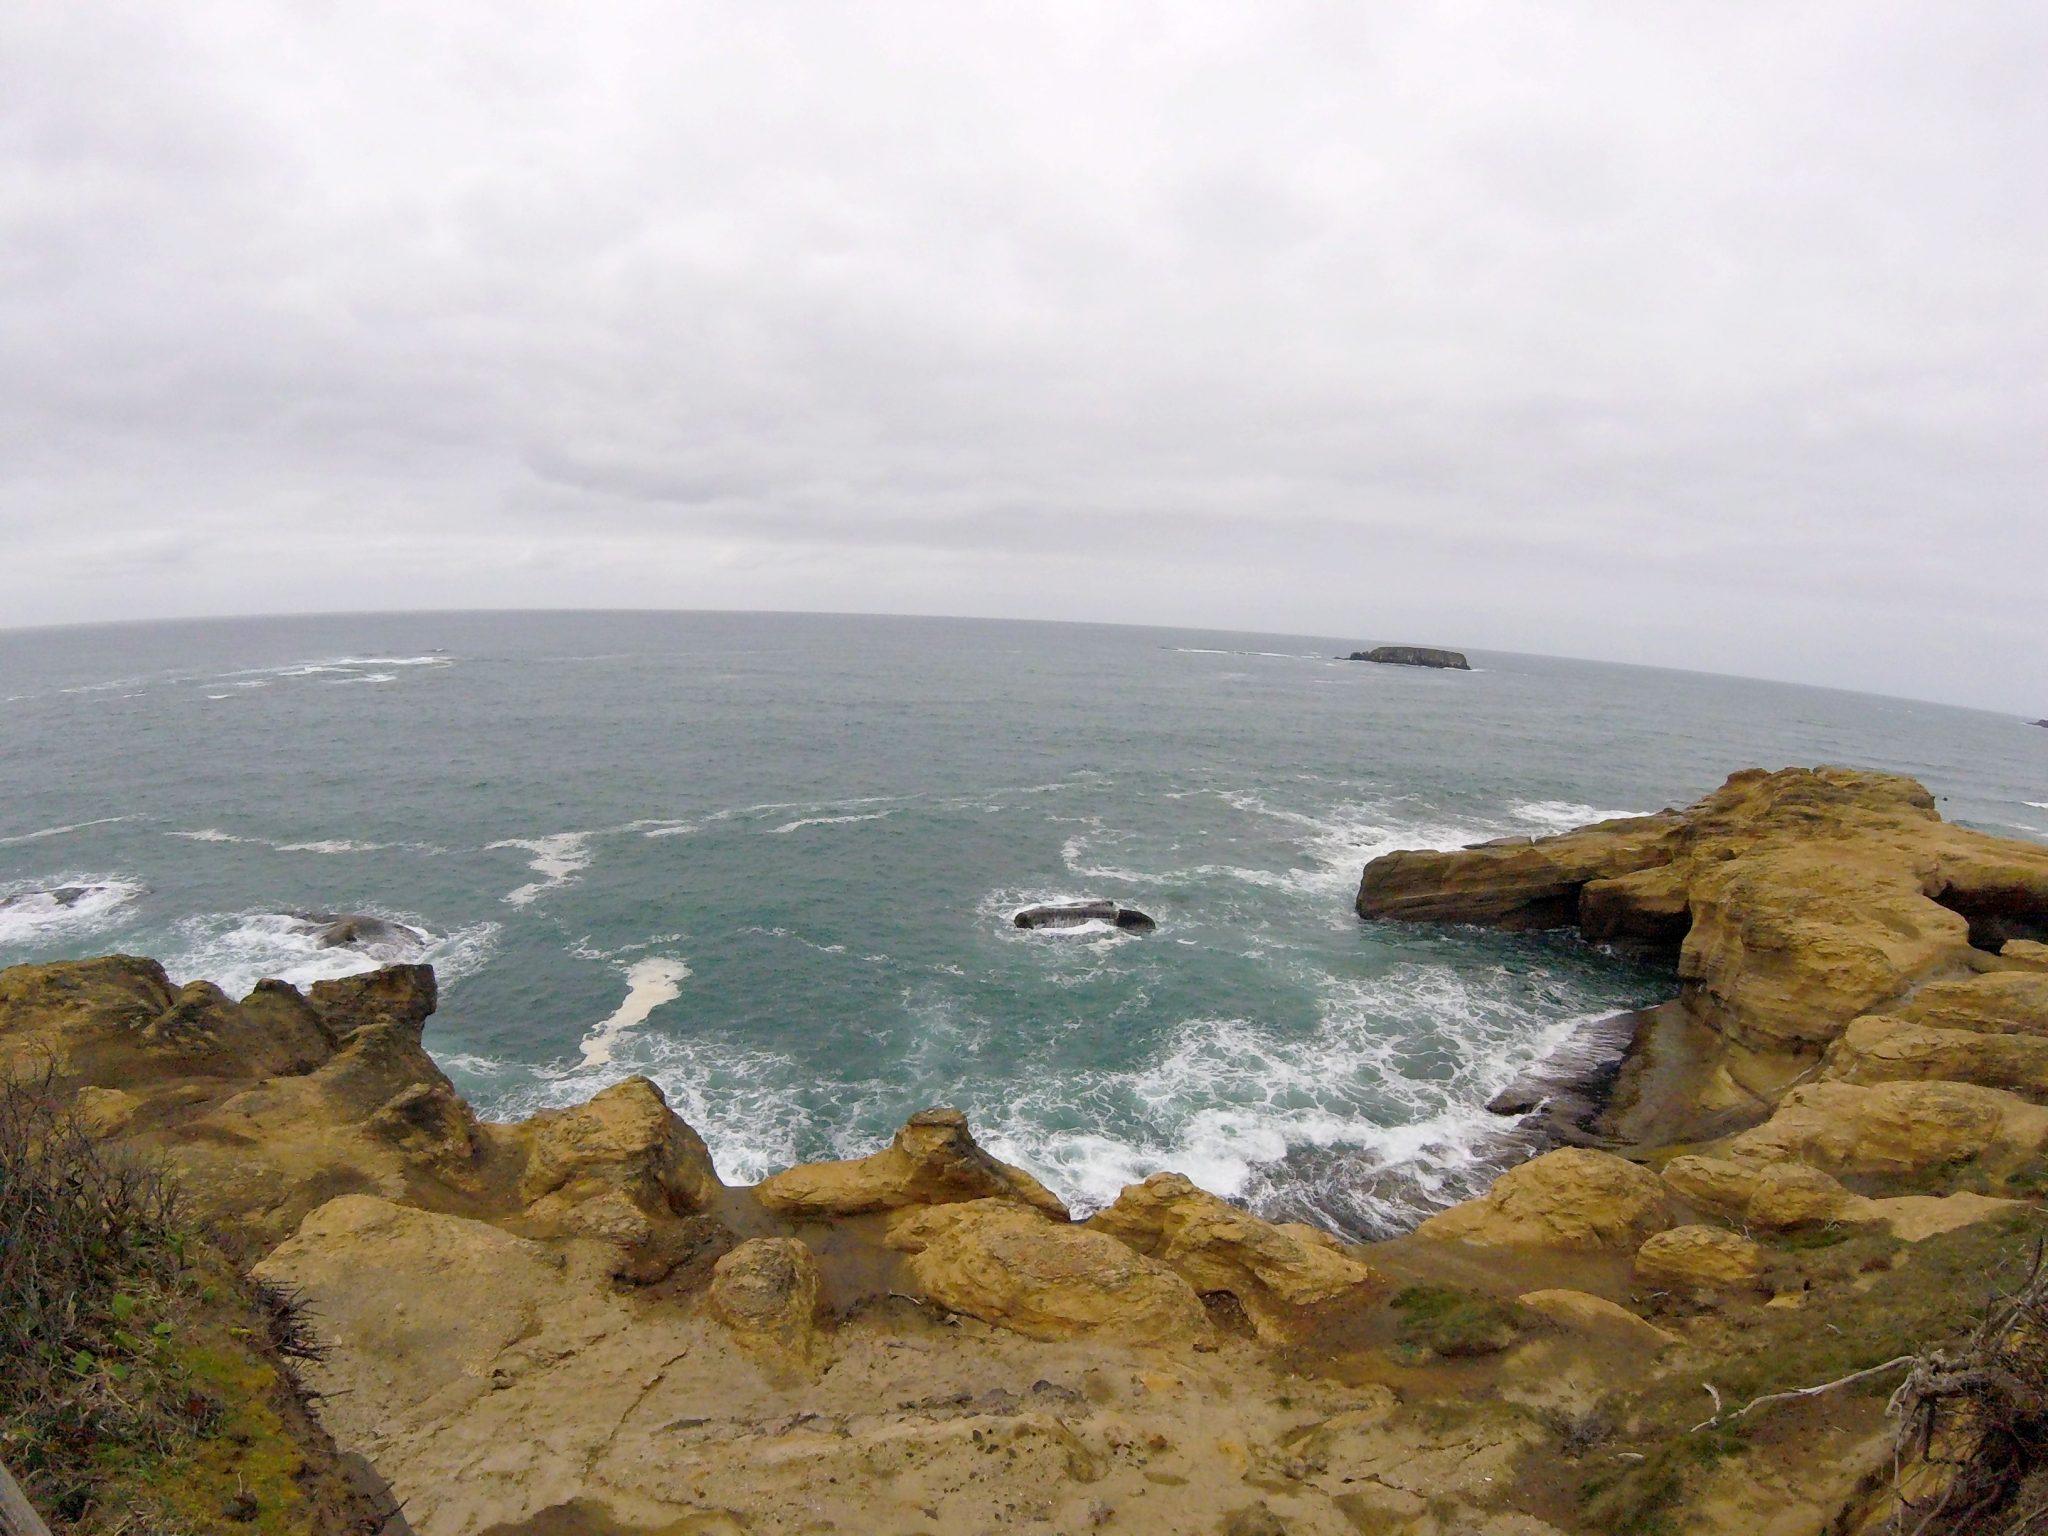 Surf Burgers >> The Oregon Coast: A Scenic Road Trip from Portland